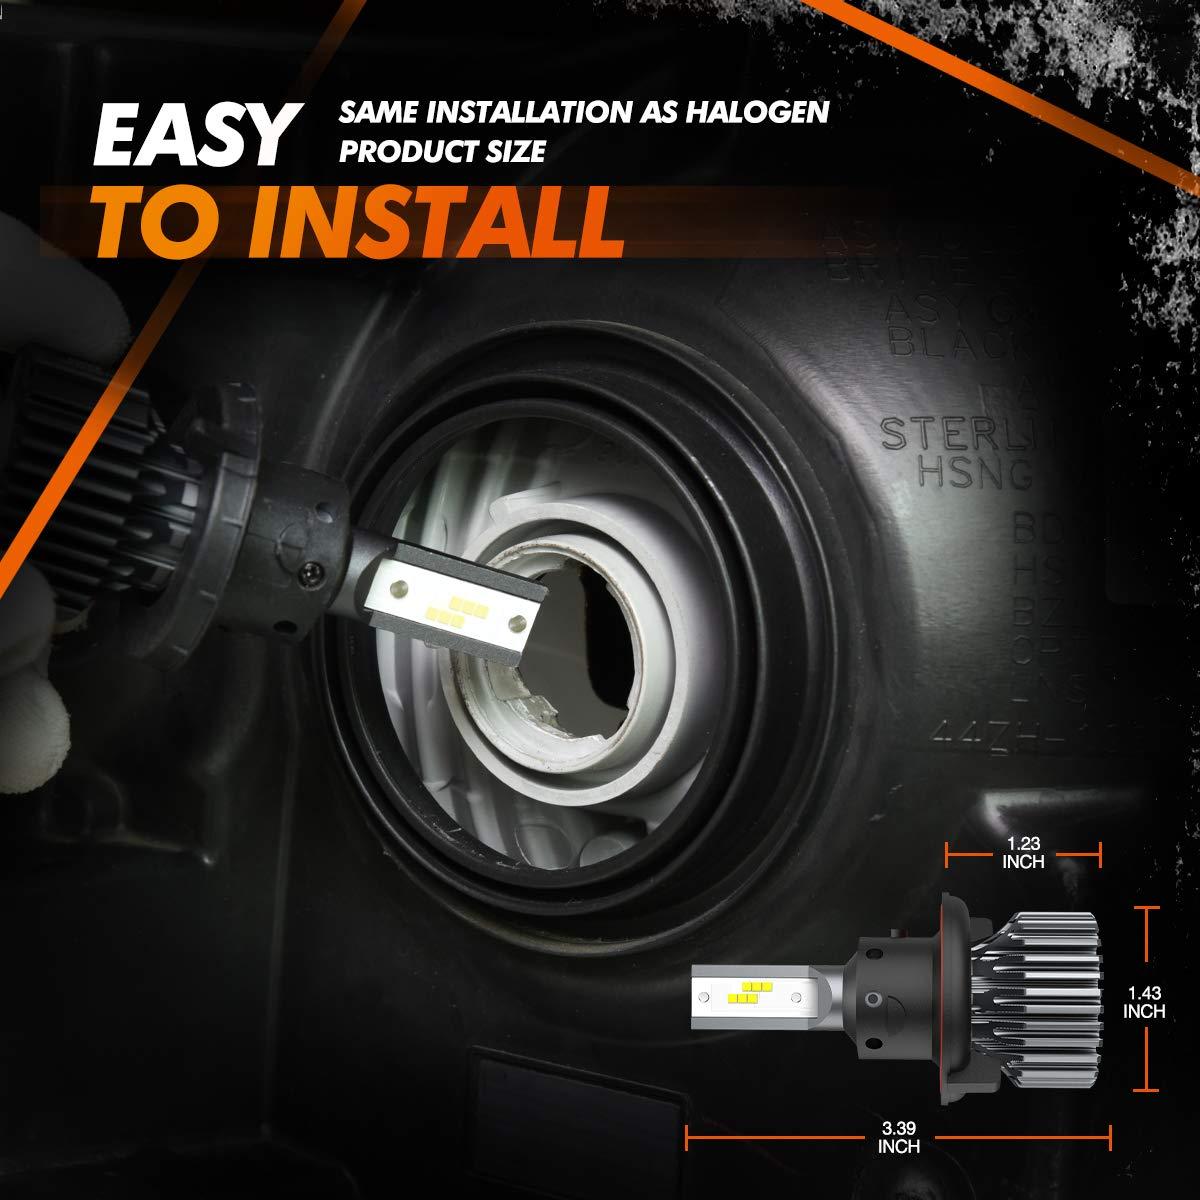 SEALIGHT H4 9003 HB2 LED Headlight Bulbs Fanless 6000K White High Low Beam CSP Chips Halogen Headlight Replacement 30W 5000Lumens